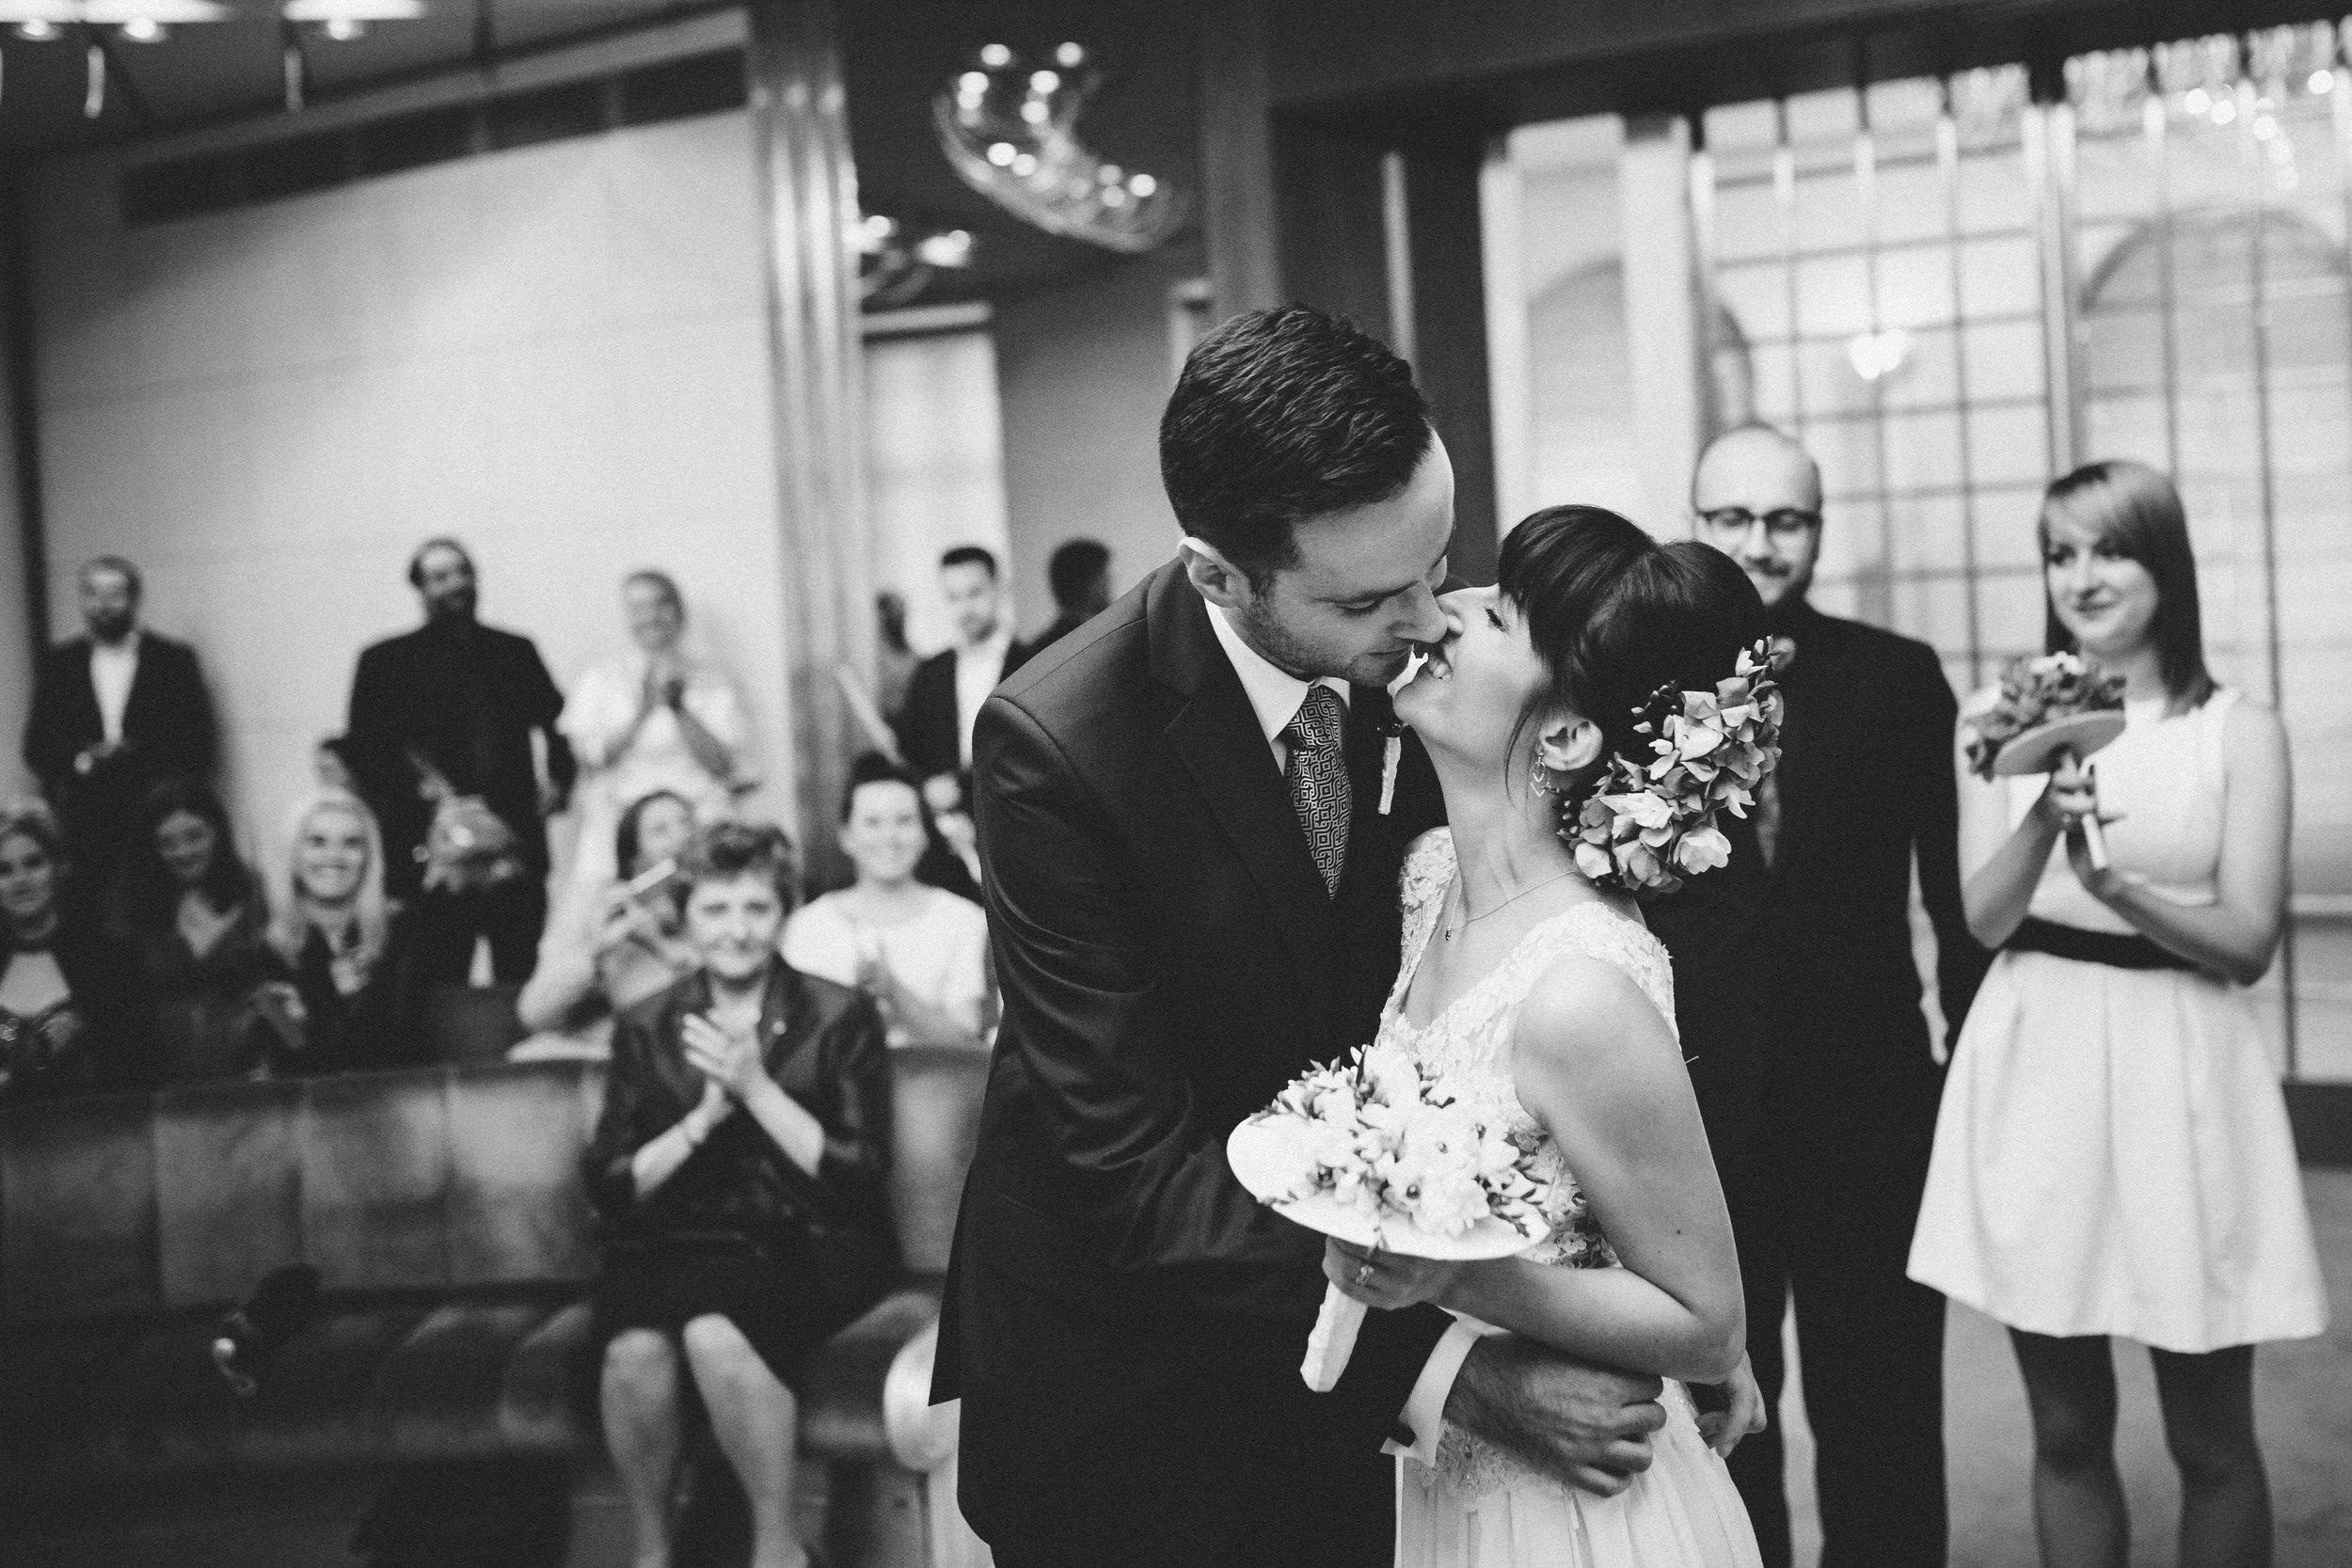 destination-wedding-photographer-bratislava-slovakia-europe-ceremony-bw-documentary-kiss.jpg